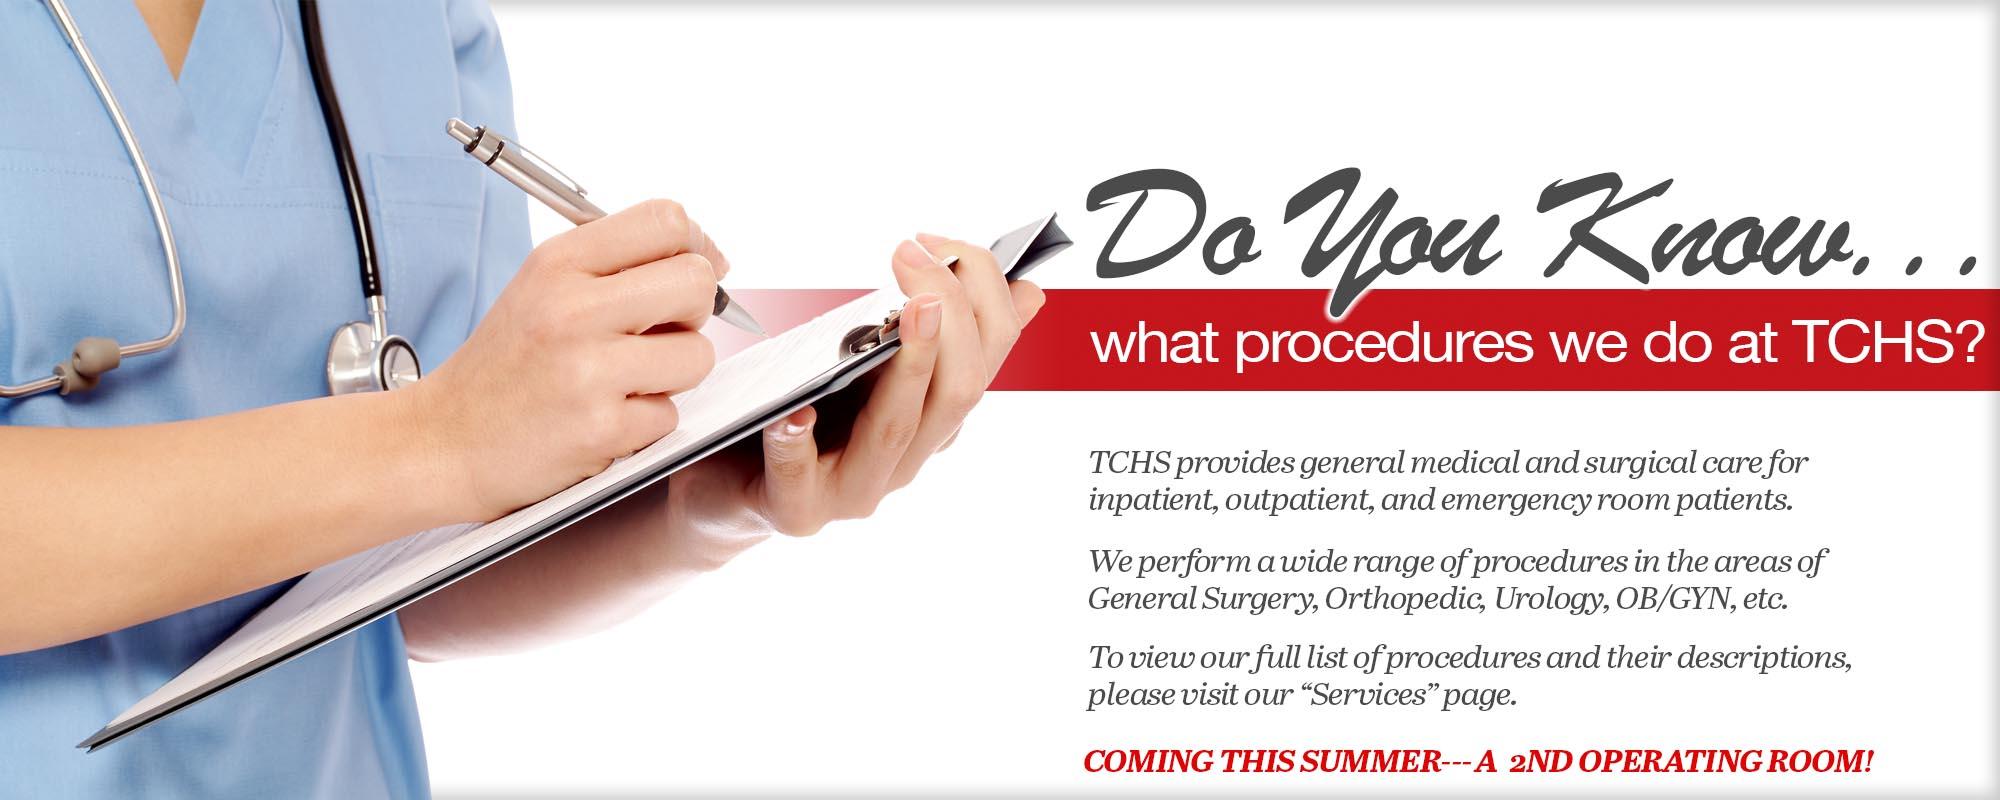 Procedures at TCHS